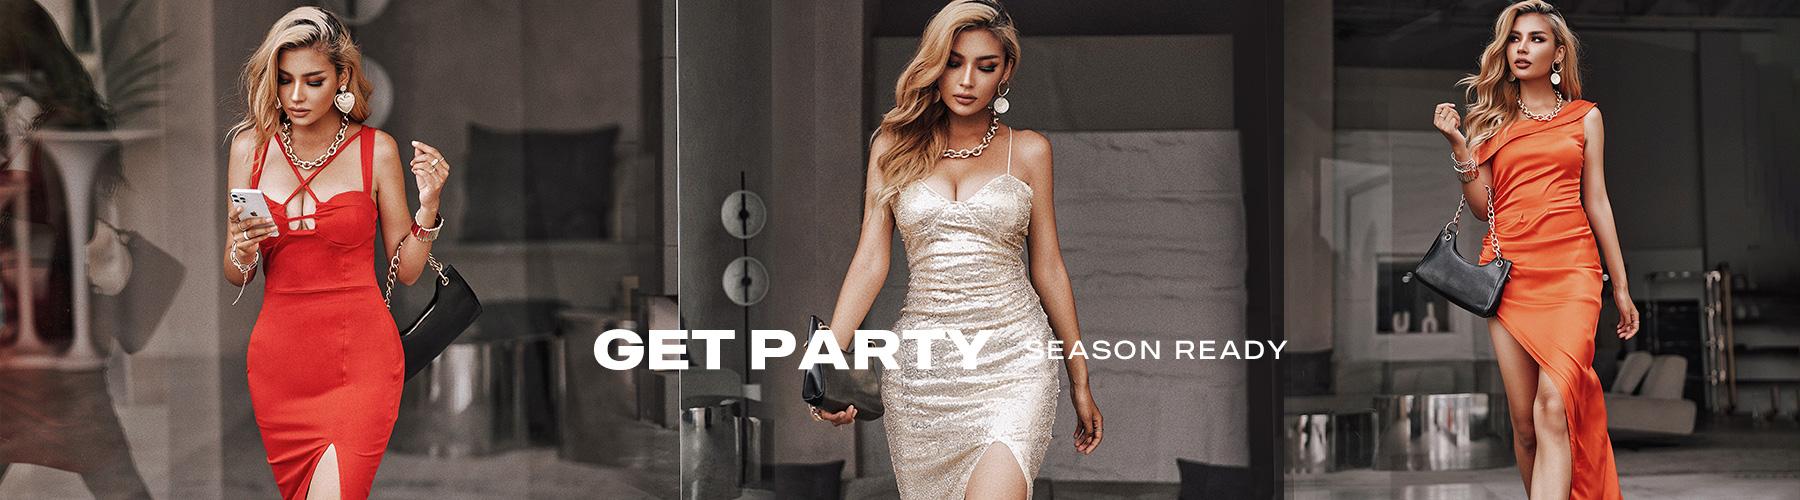 Get Party Season Ready